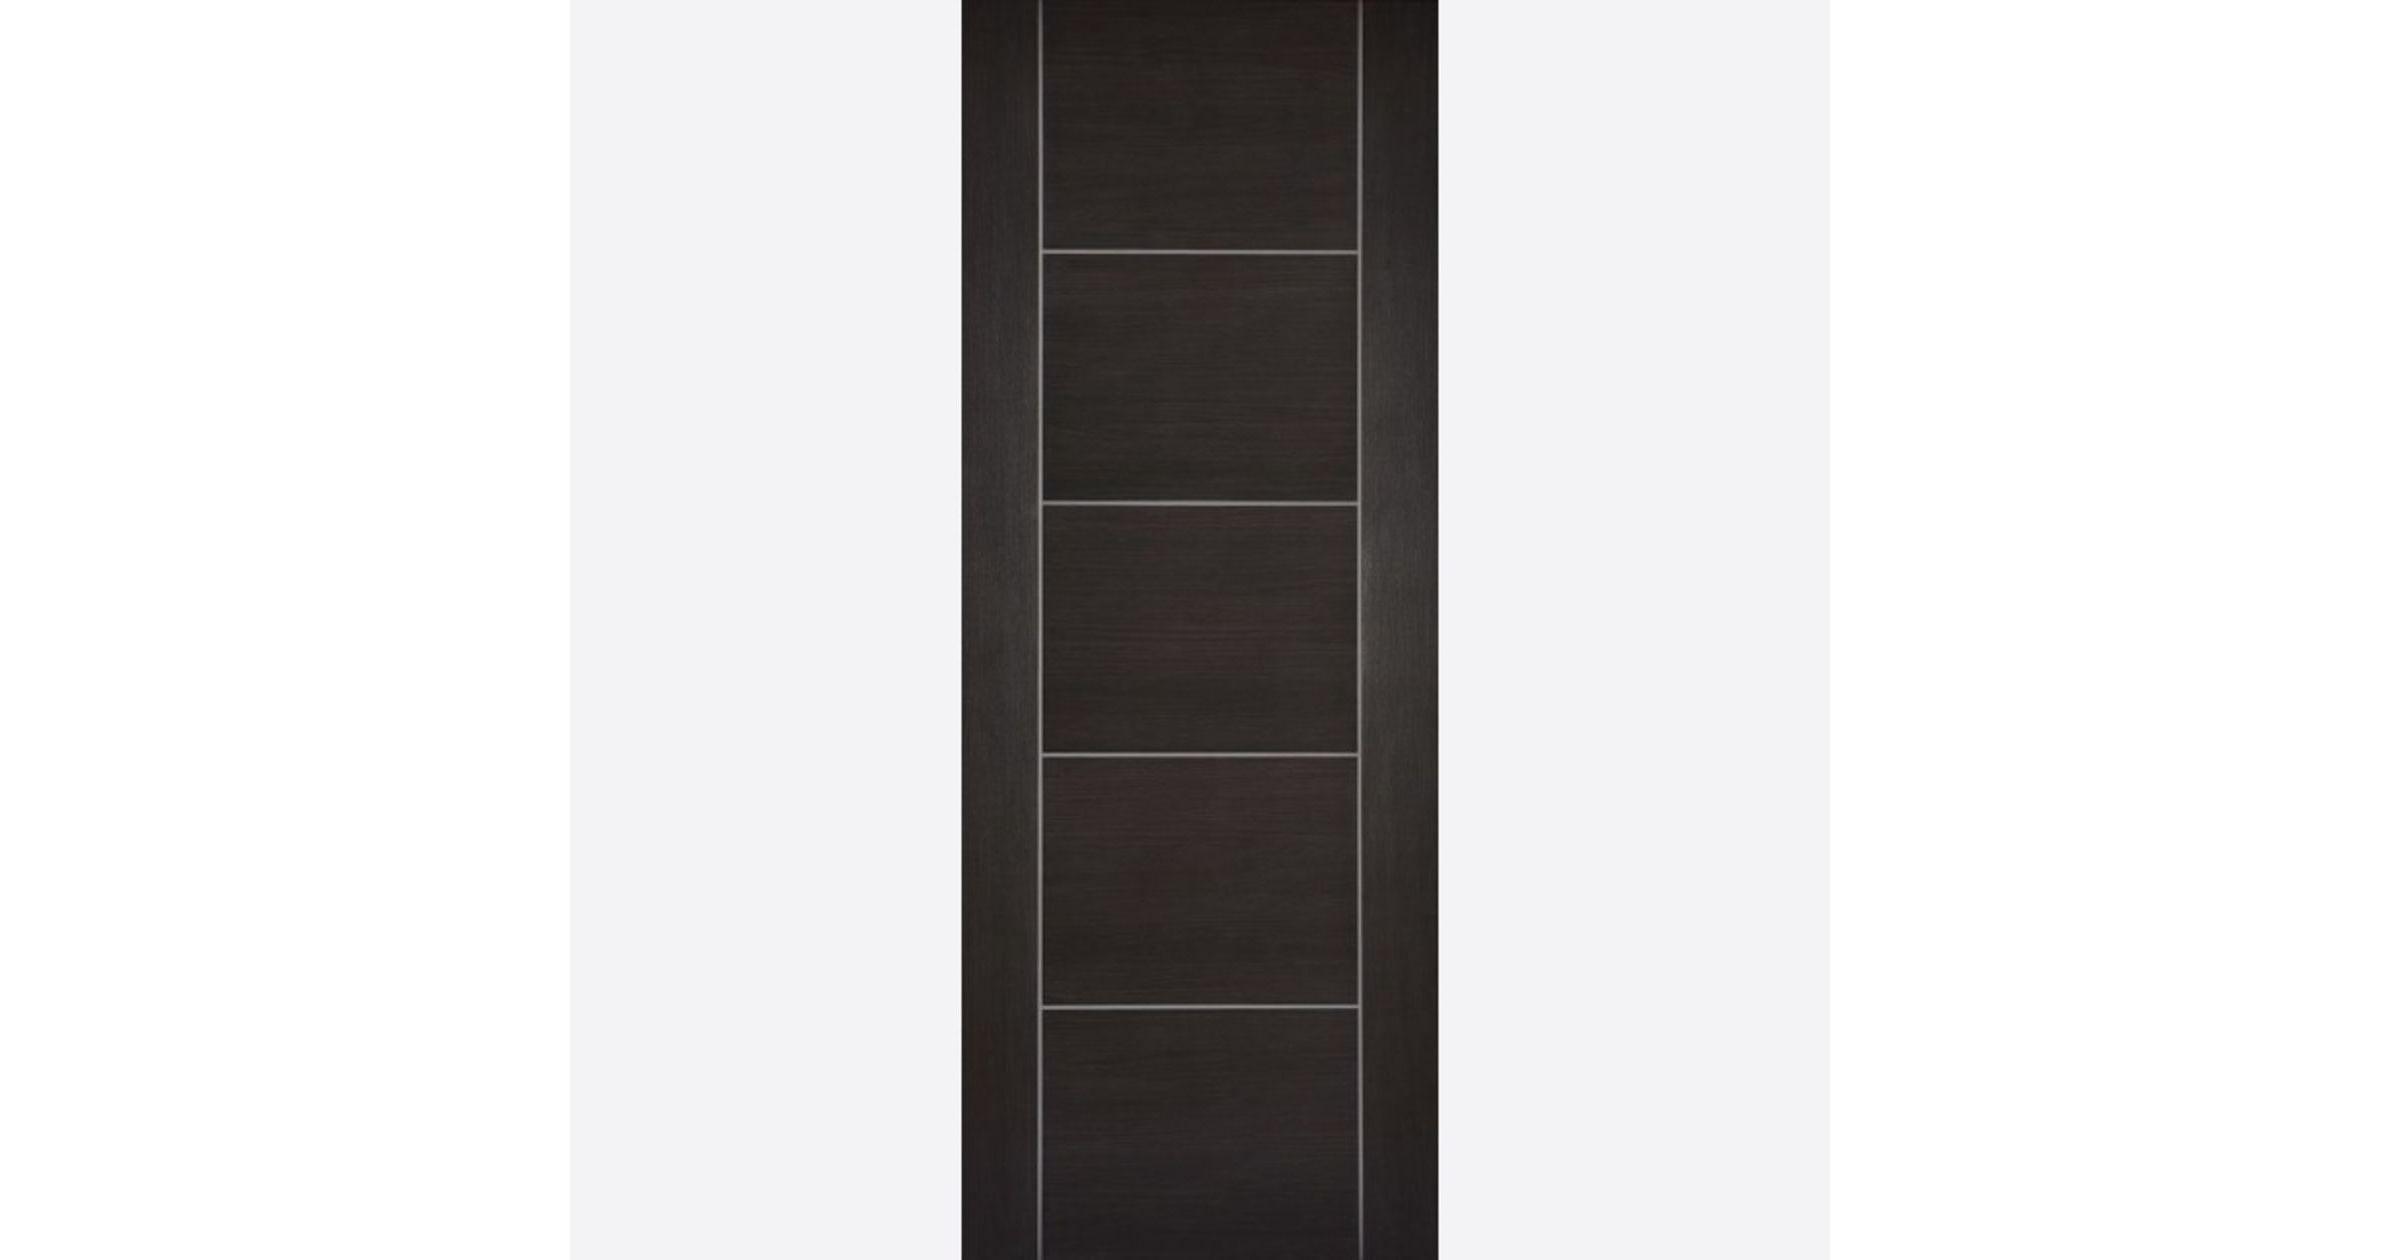 Vancouver Door Flush *Pre-Finished Dark-Grey Laminate* 35mm Internal - LPD Laminate Doors & Vancouver Door: Flush *Pre-Finished Dark-Grey Laminate* 35mm Internal - LPD Laminate Doors